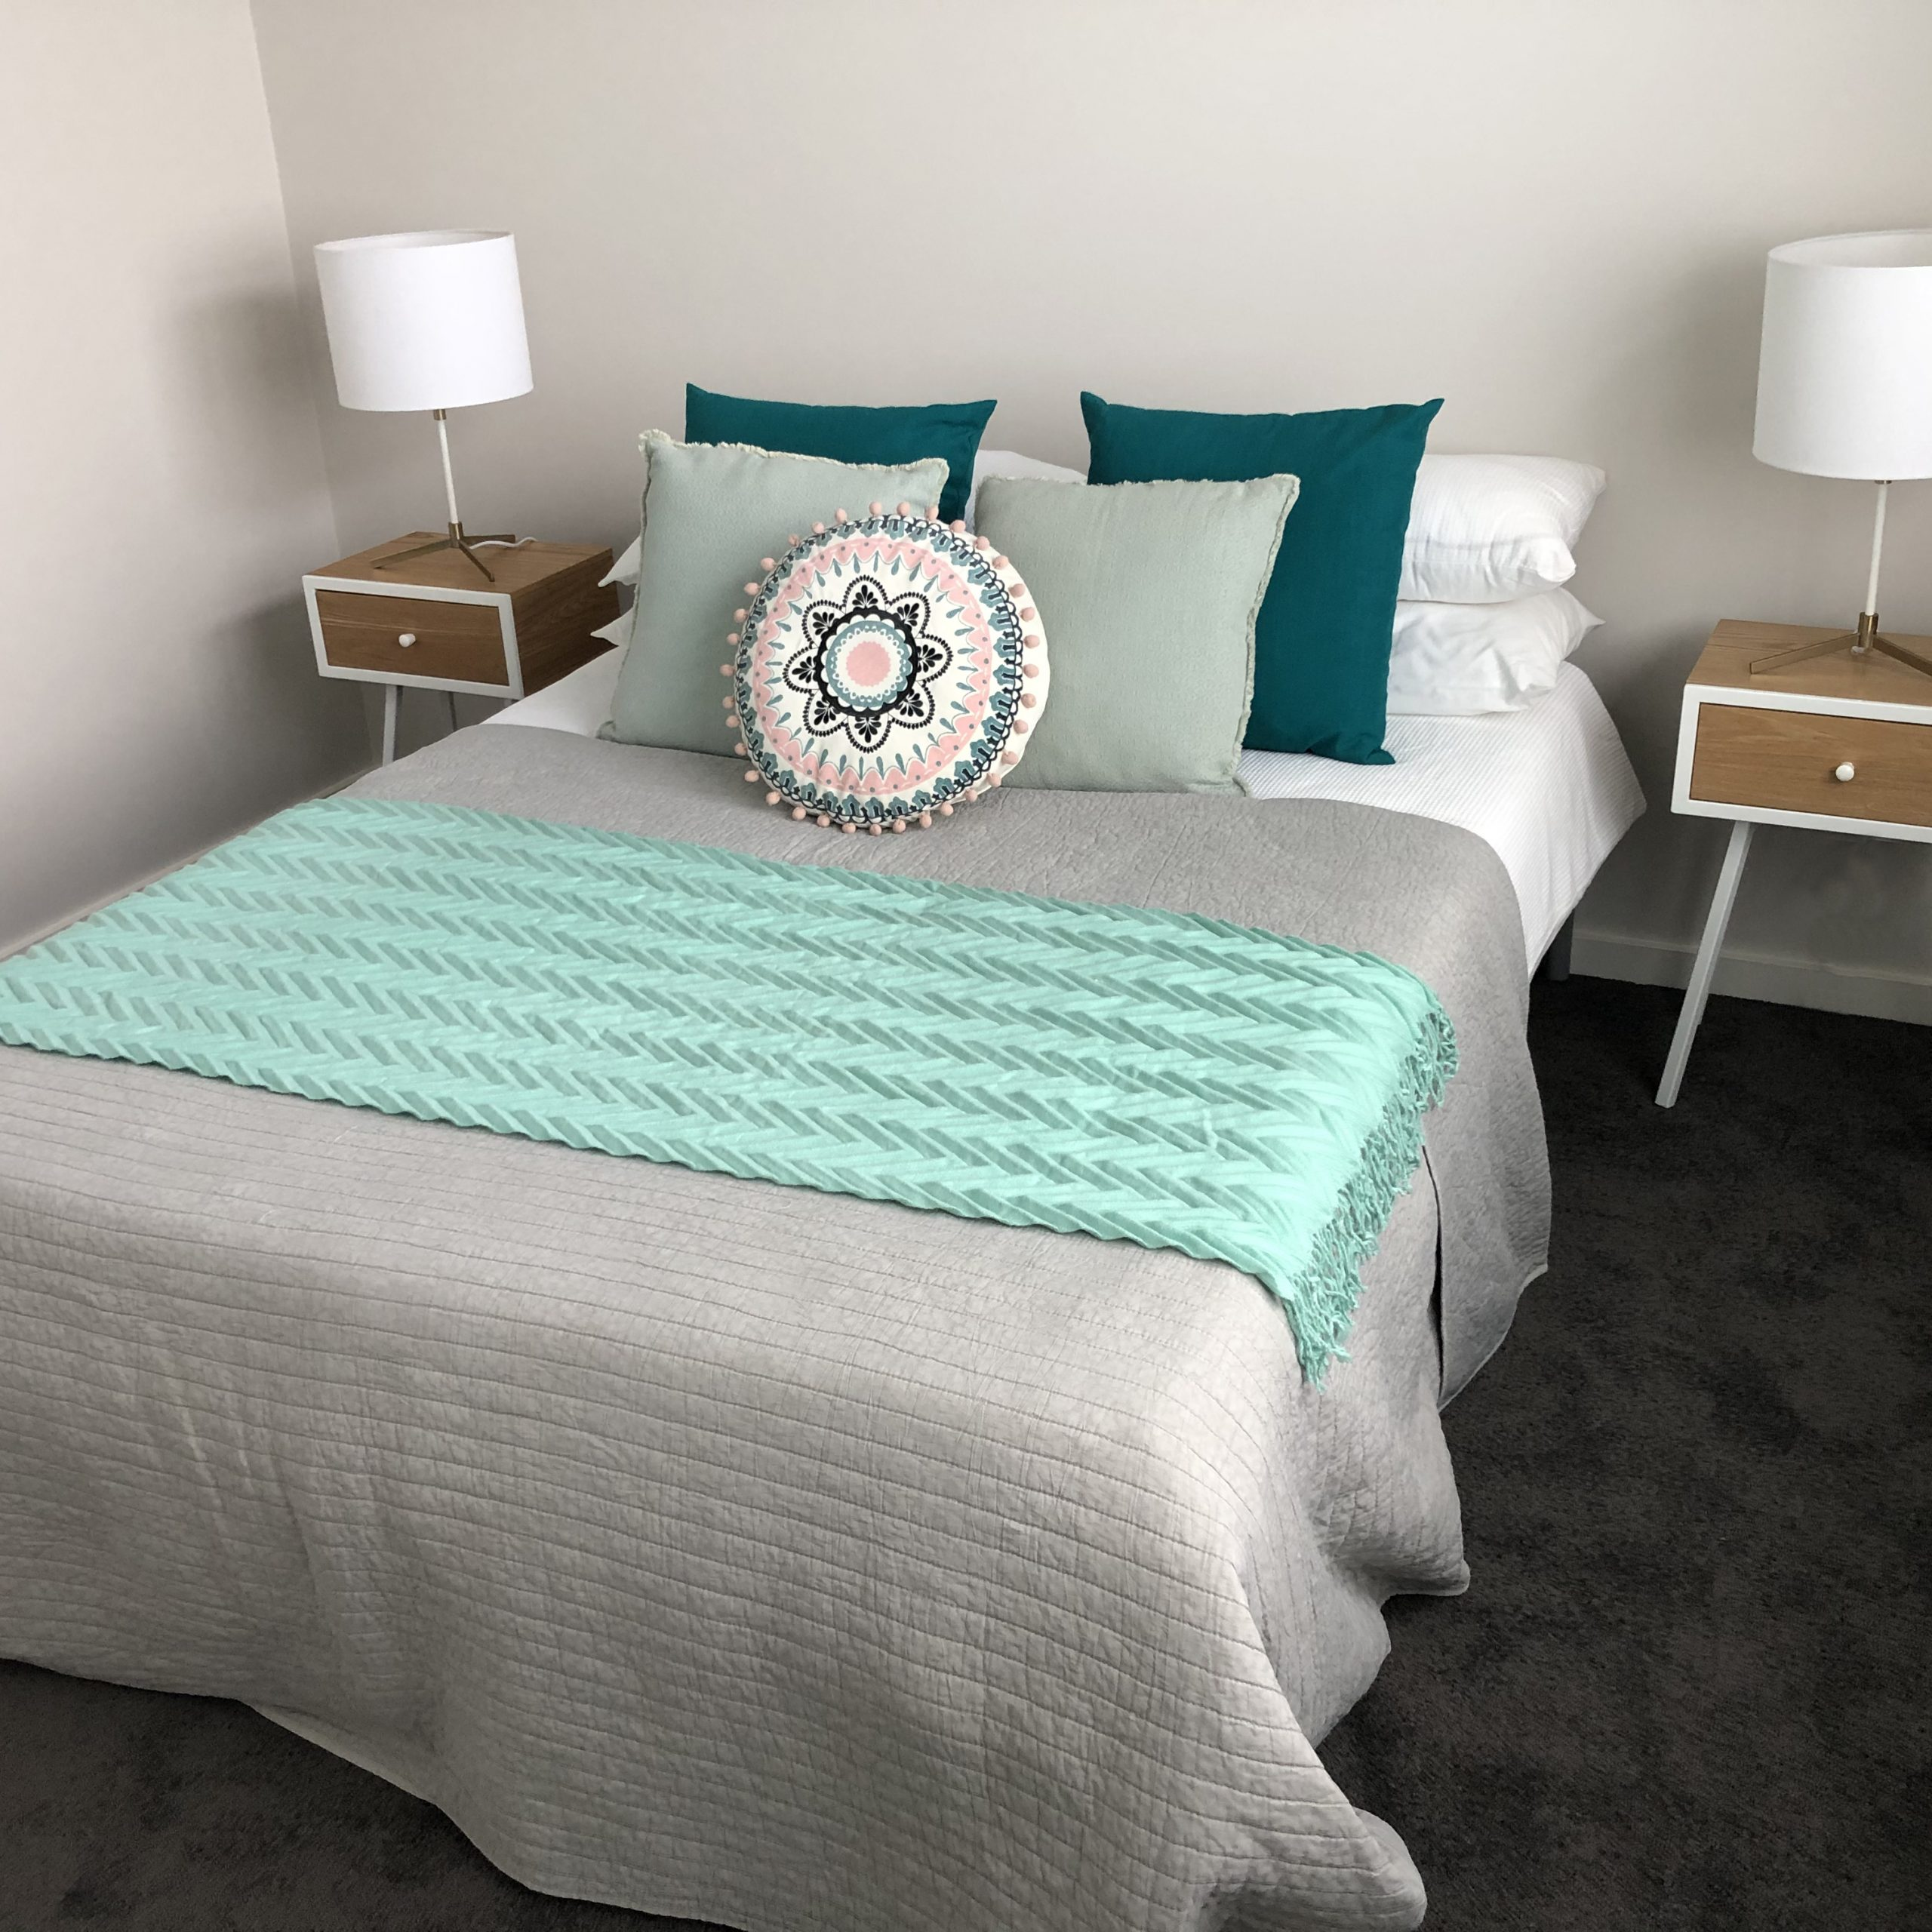 Styled bedroom with aqua accents - Interior Decorator Service - Leeder Interiors